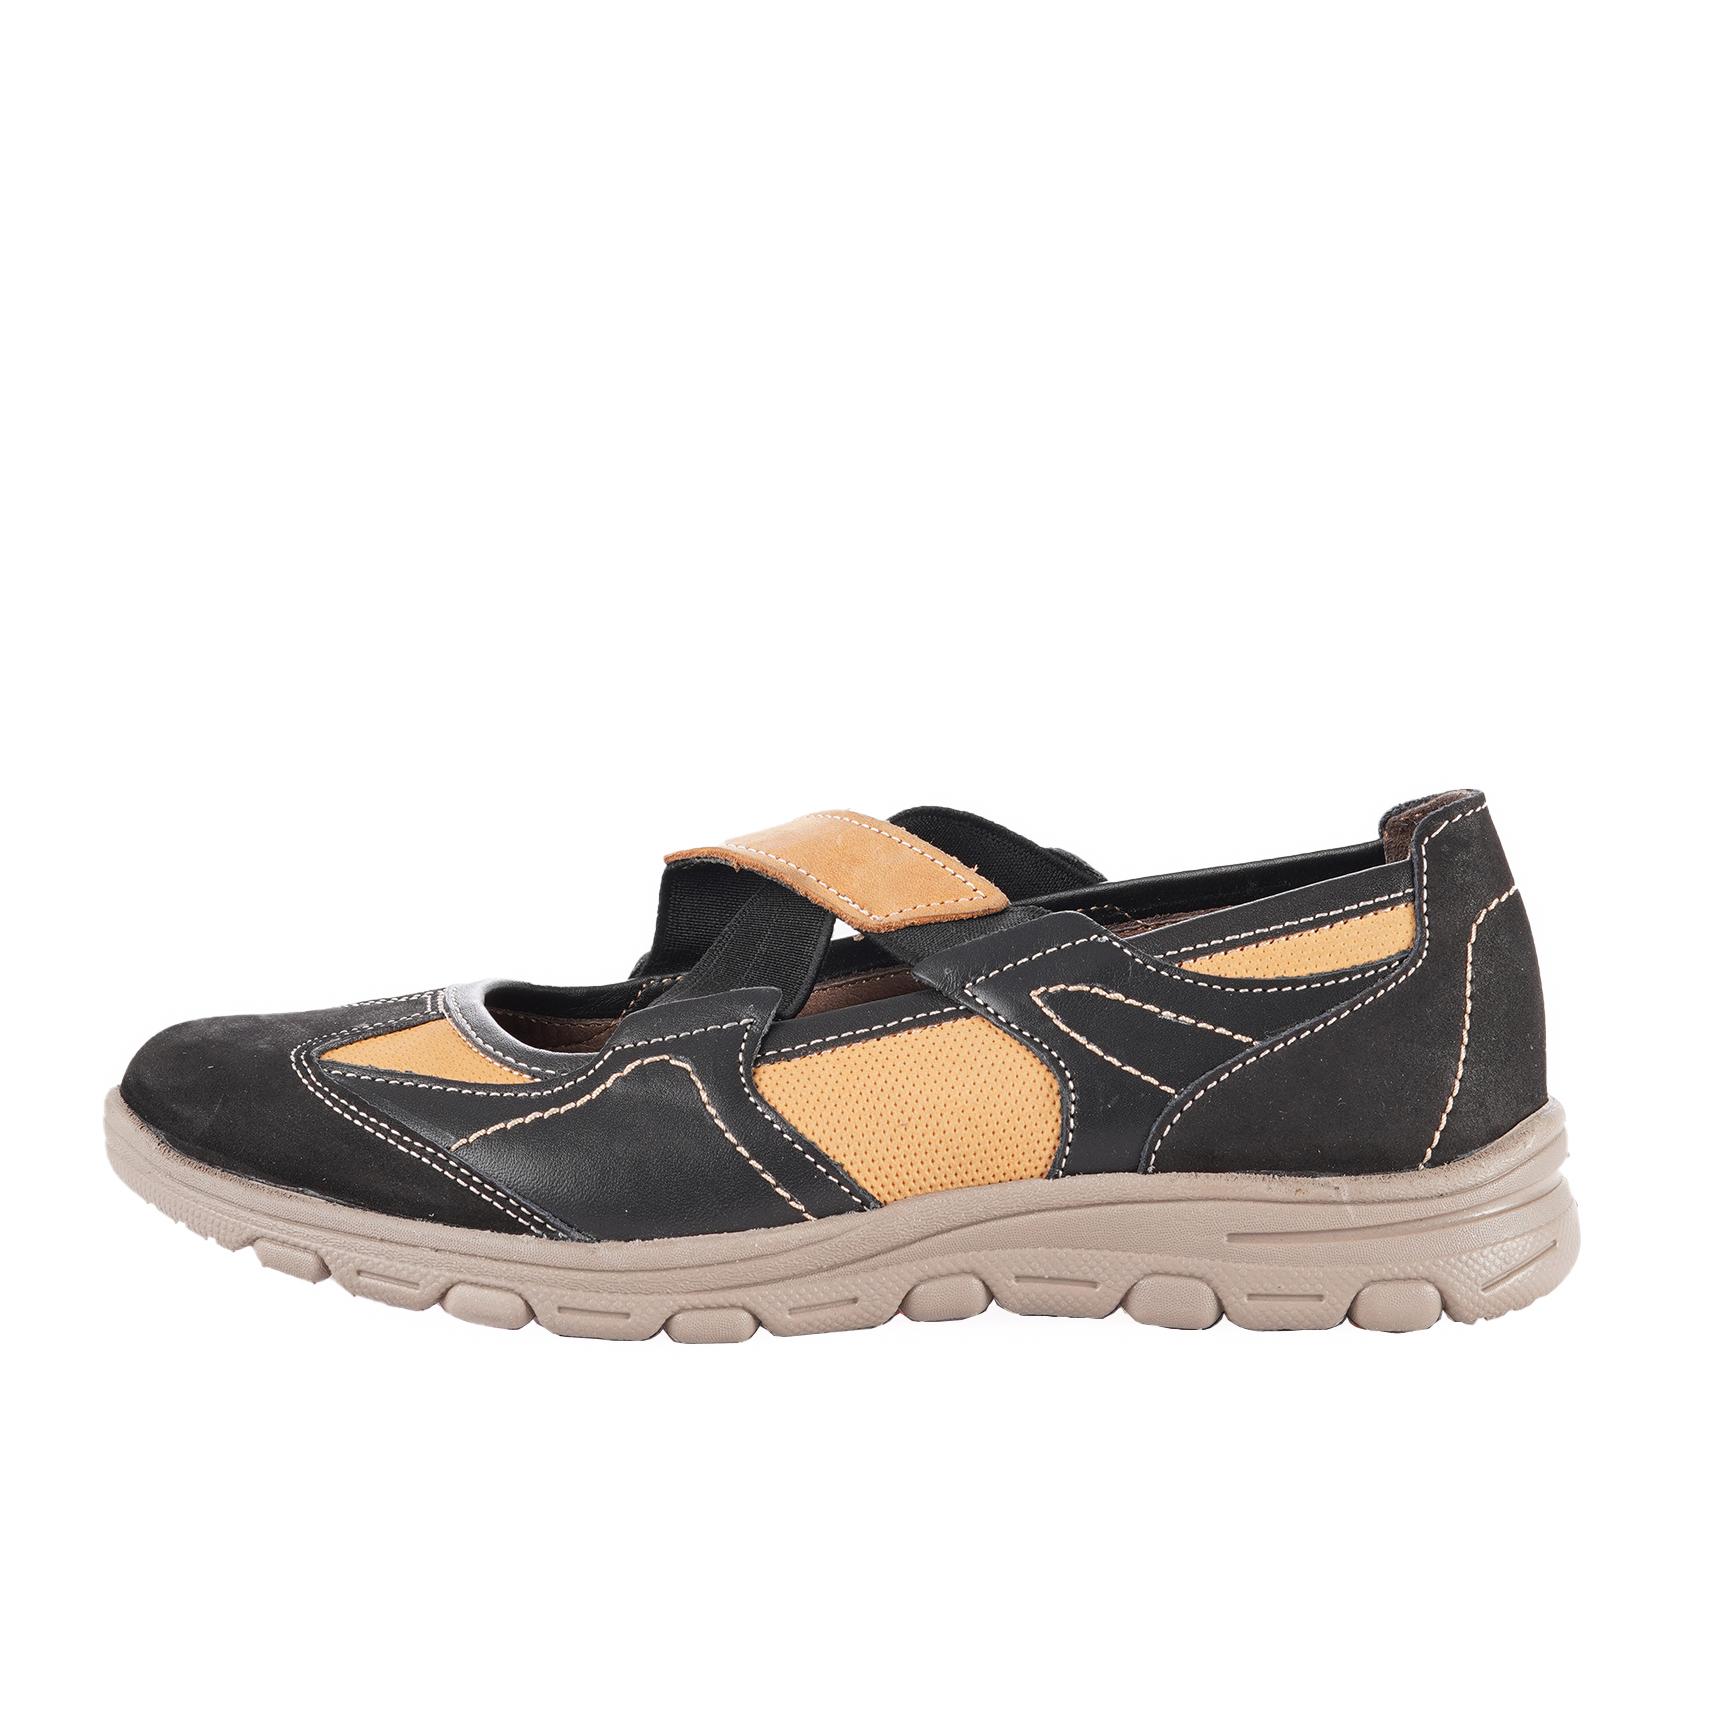 کفش روزمره زنانه صاد کد PP2403